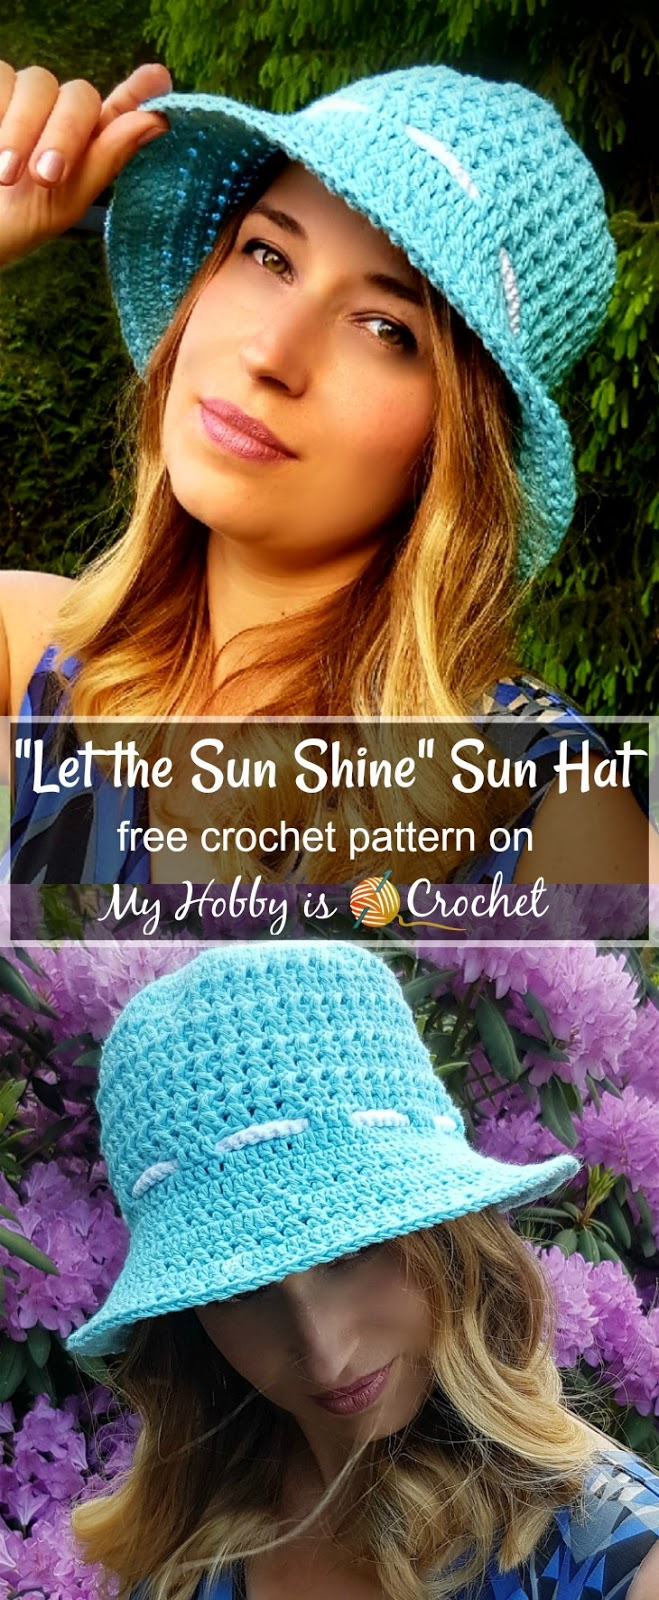 """Let the Sun Shine!"" Sun Hat - Free Crochet Pattern on myhobbyiscrochet.com"